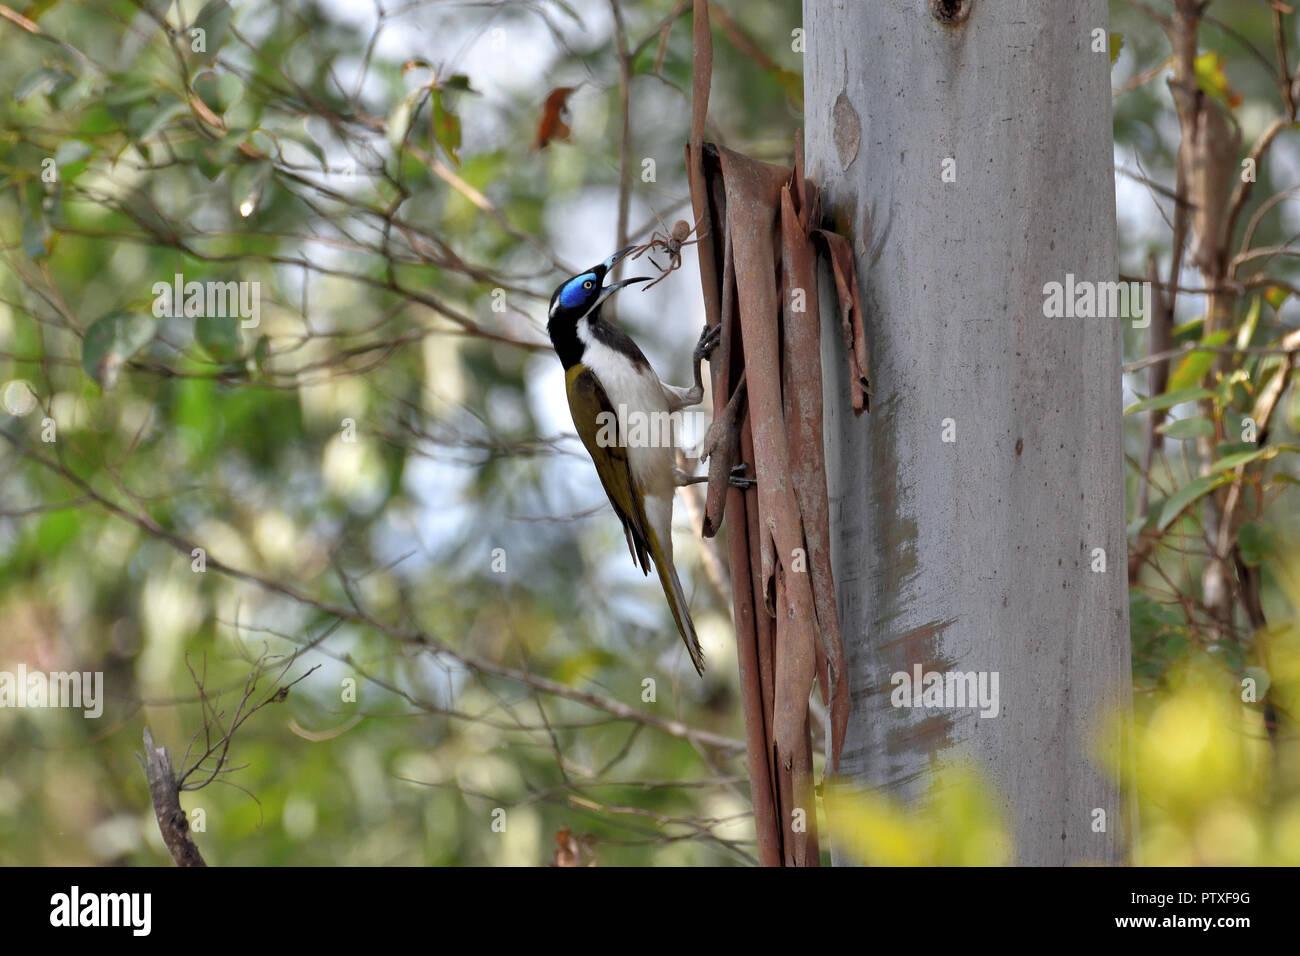 An Australian, Queensland Blue-faced Honeyeater ( Entomyzon cyanotis ) grabbing at a spider to eat - Stock Image